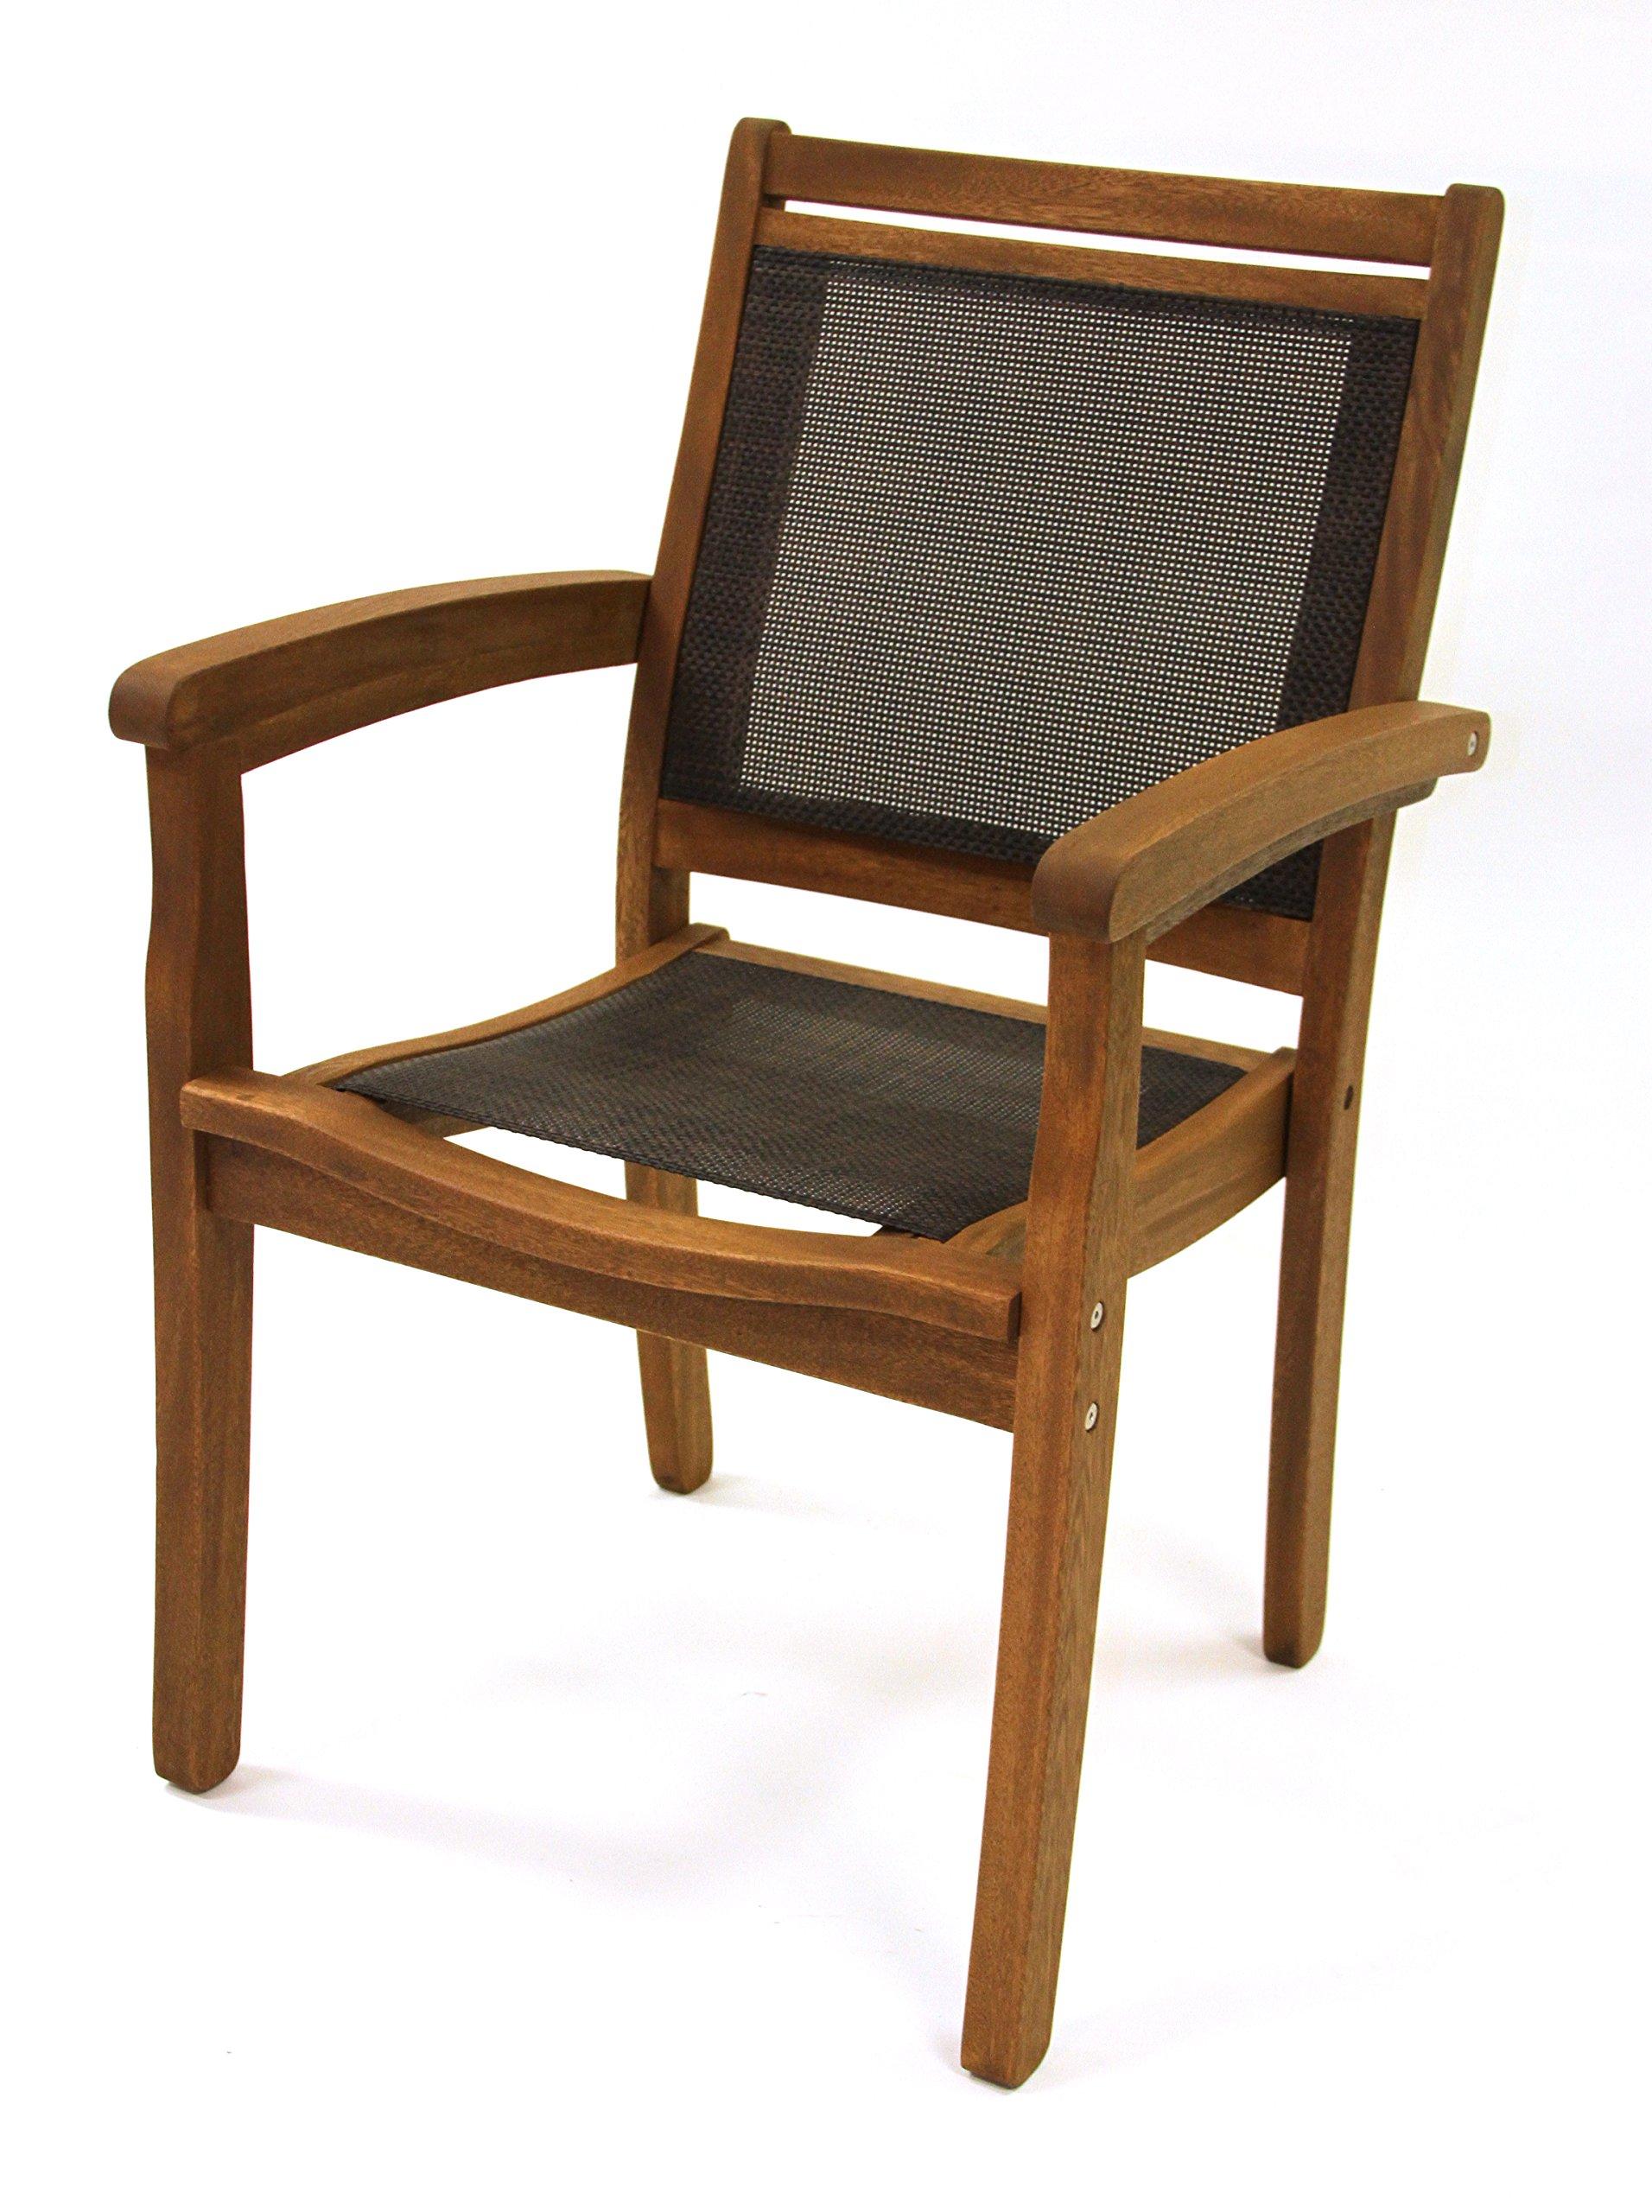 Outdoor Interiors 10555DK Sling and Eucalyptus Stackable Arm Chair, Dark Brown